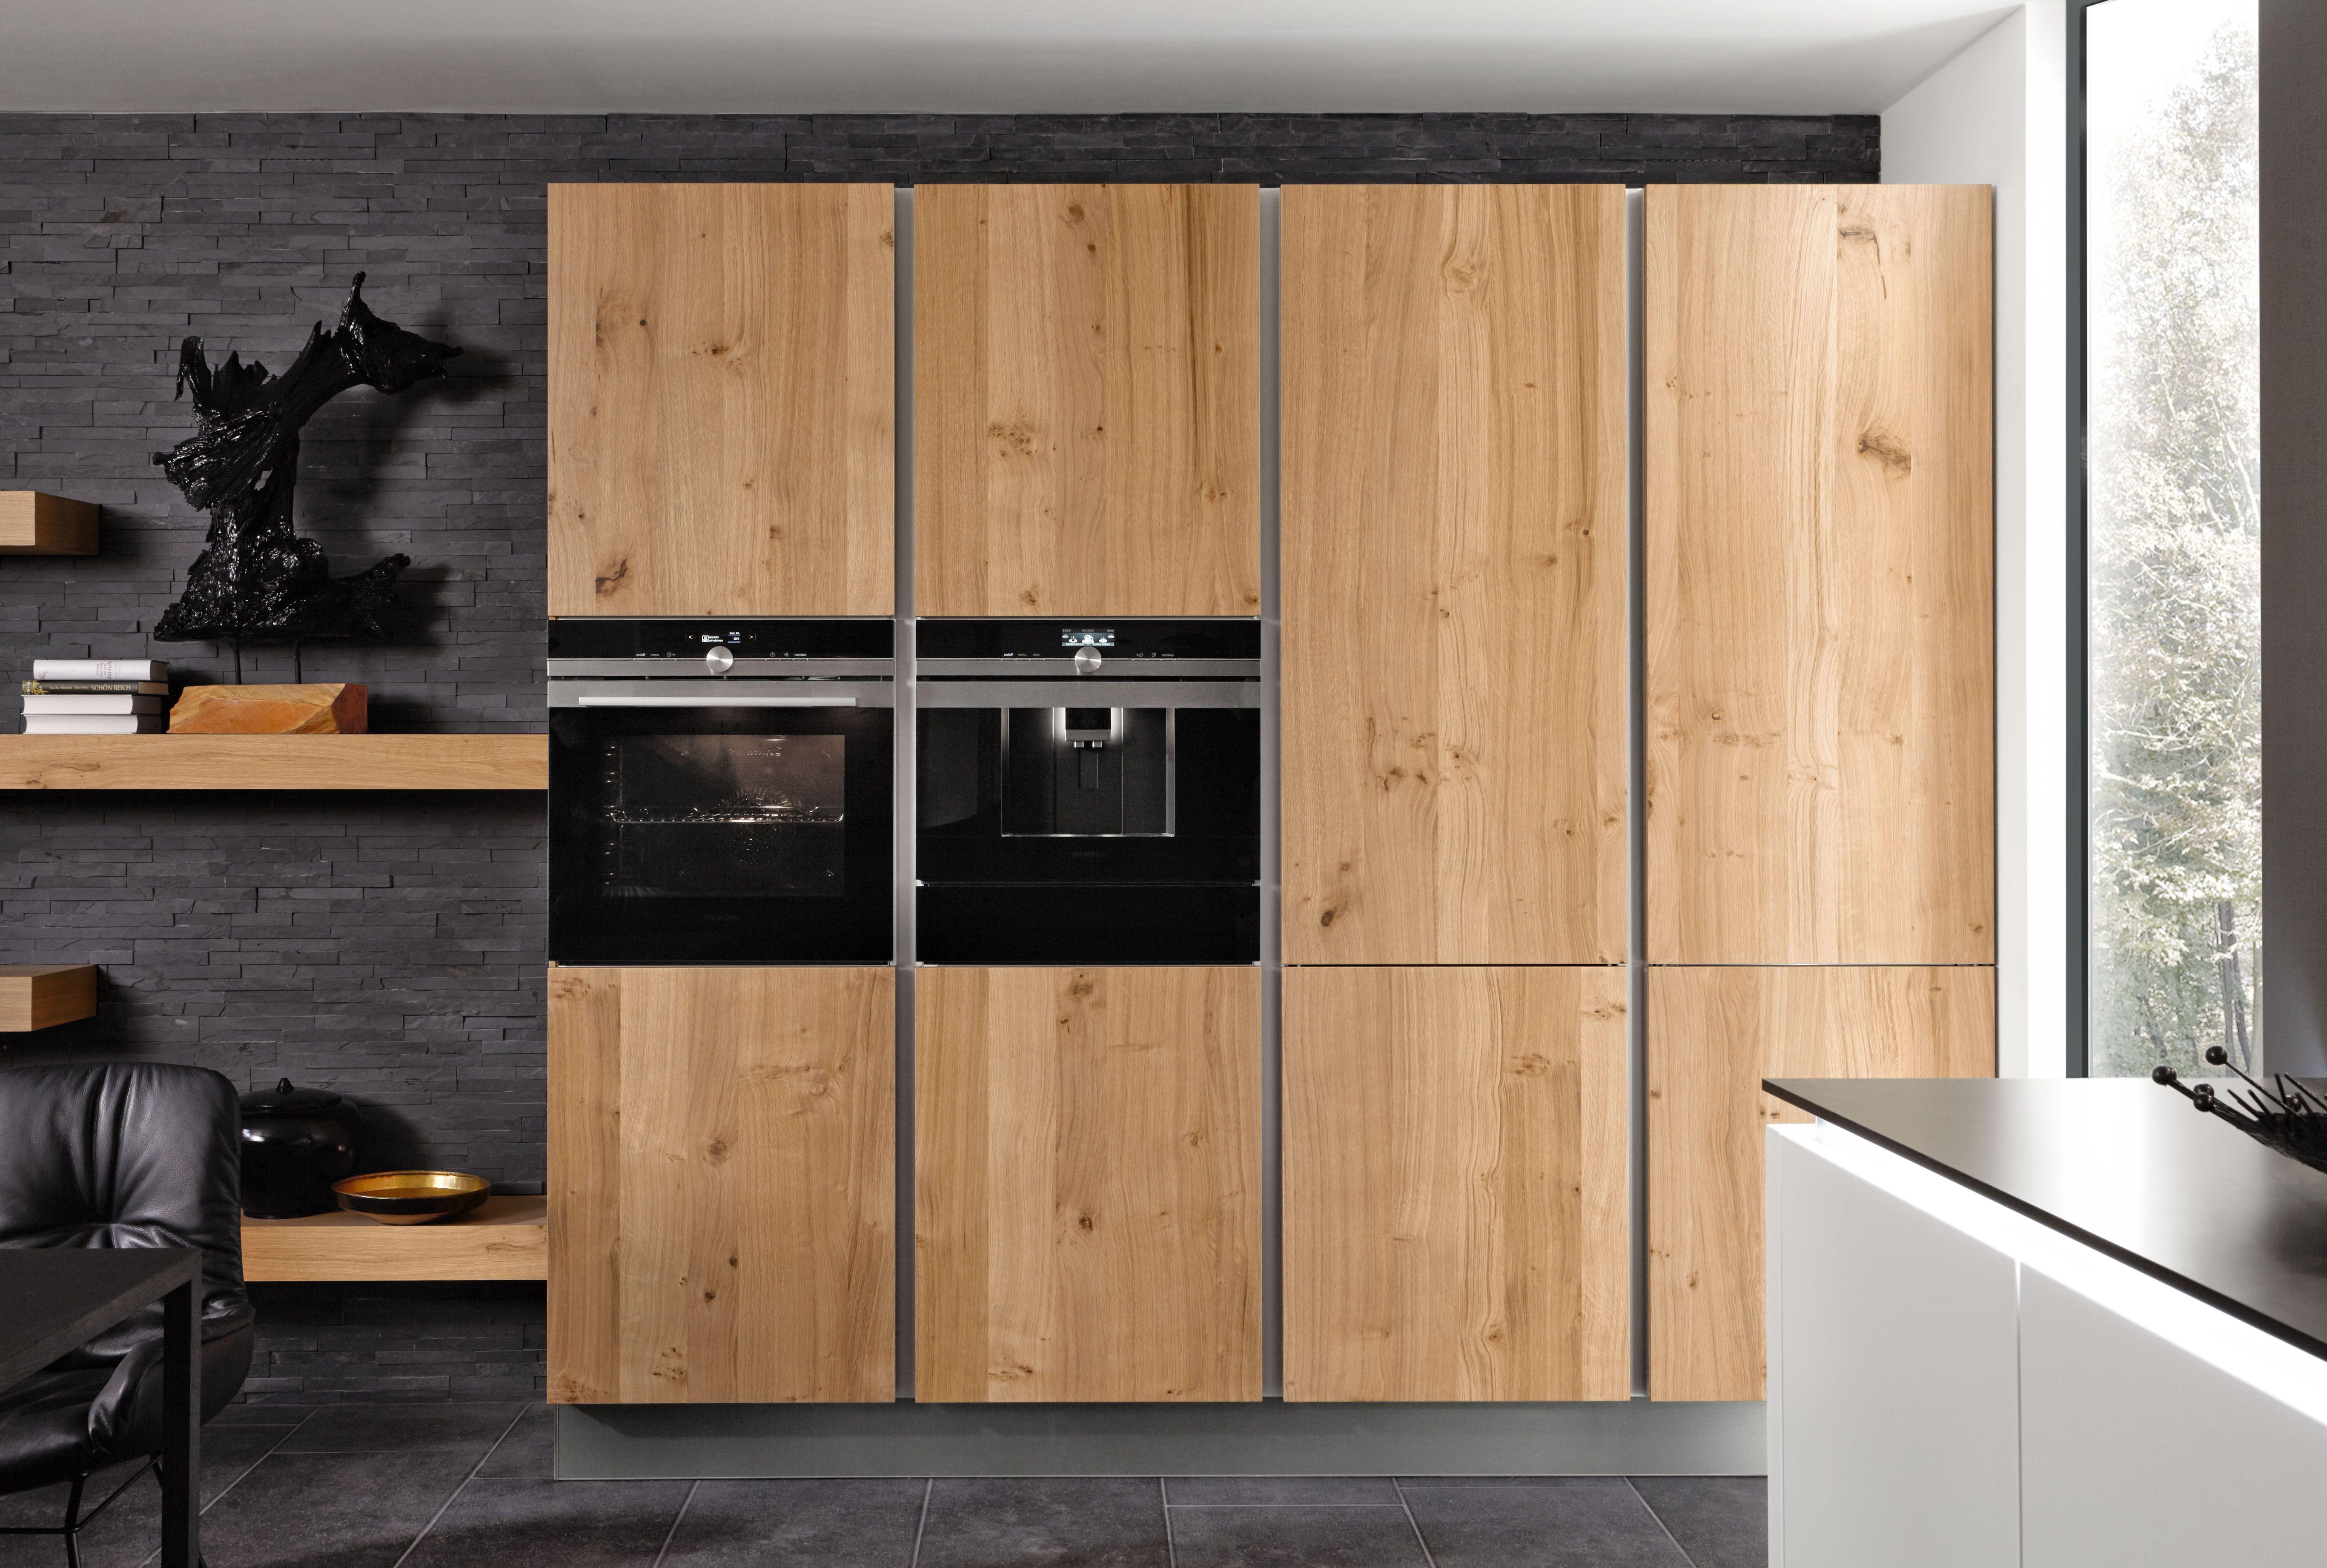 Prachtige Moderne Keuken Van Nolte Mit Bildern Nolte Kuche Zeitlose Kuche Moderne Kuchendesigns